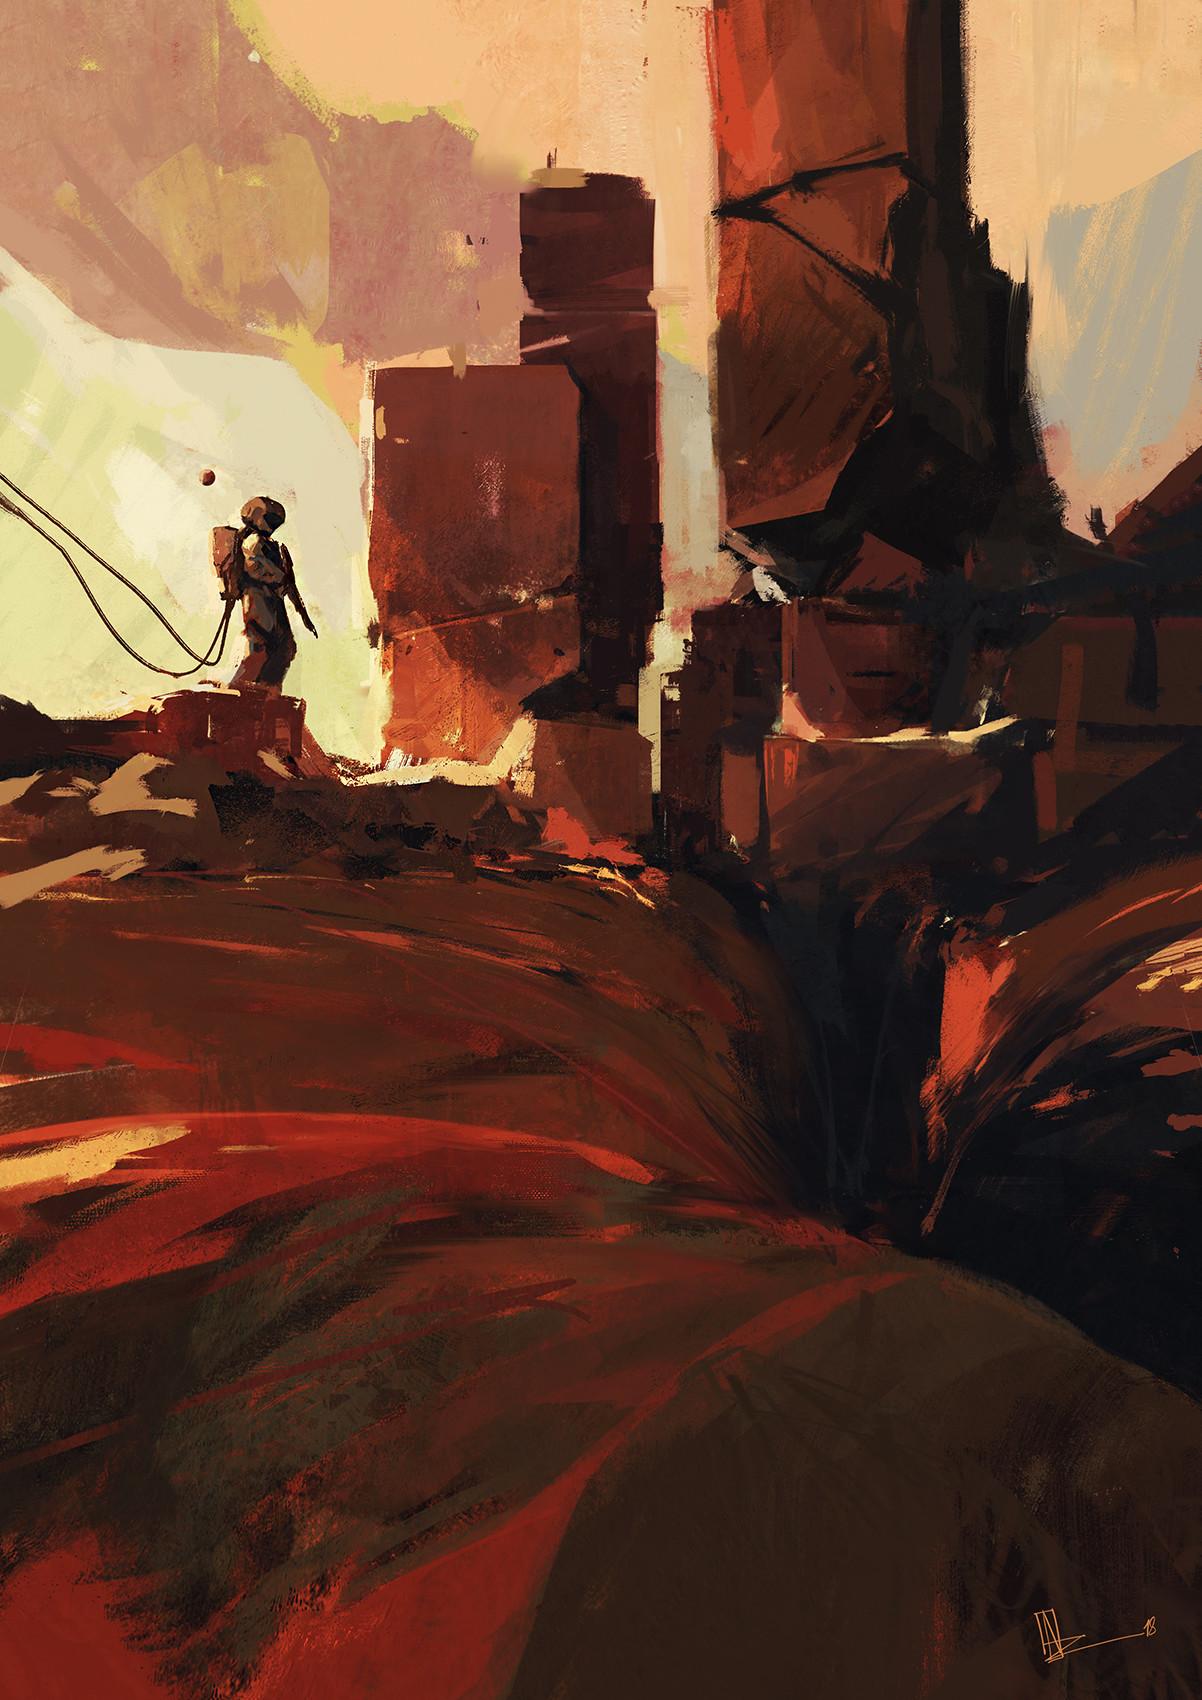 Amir zand artstation2